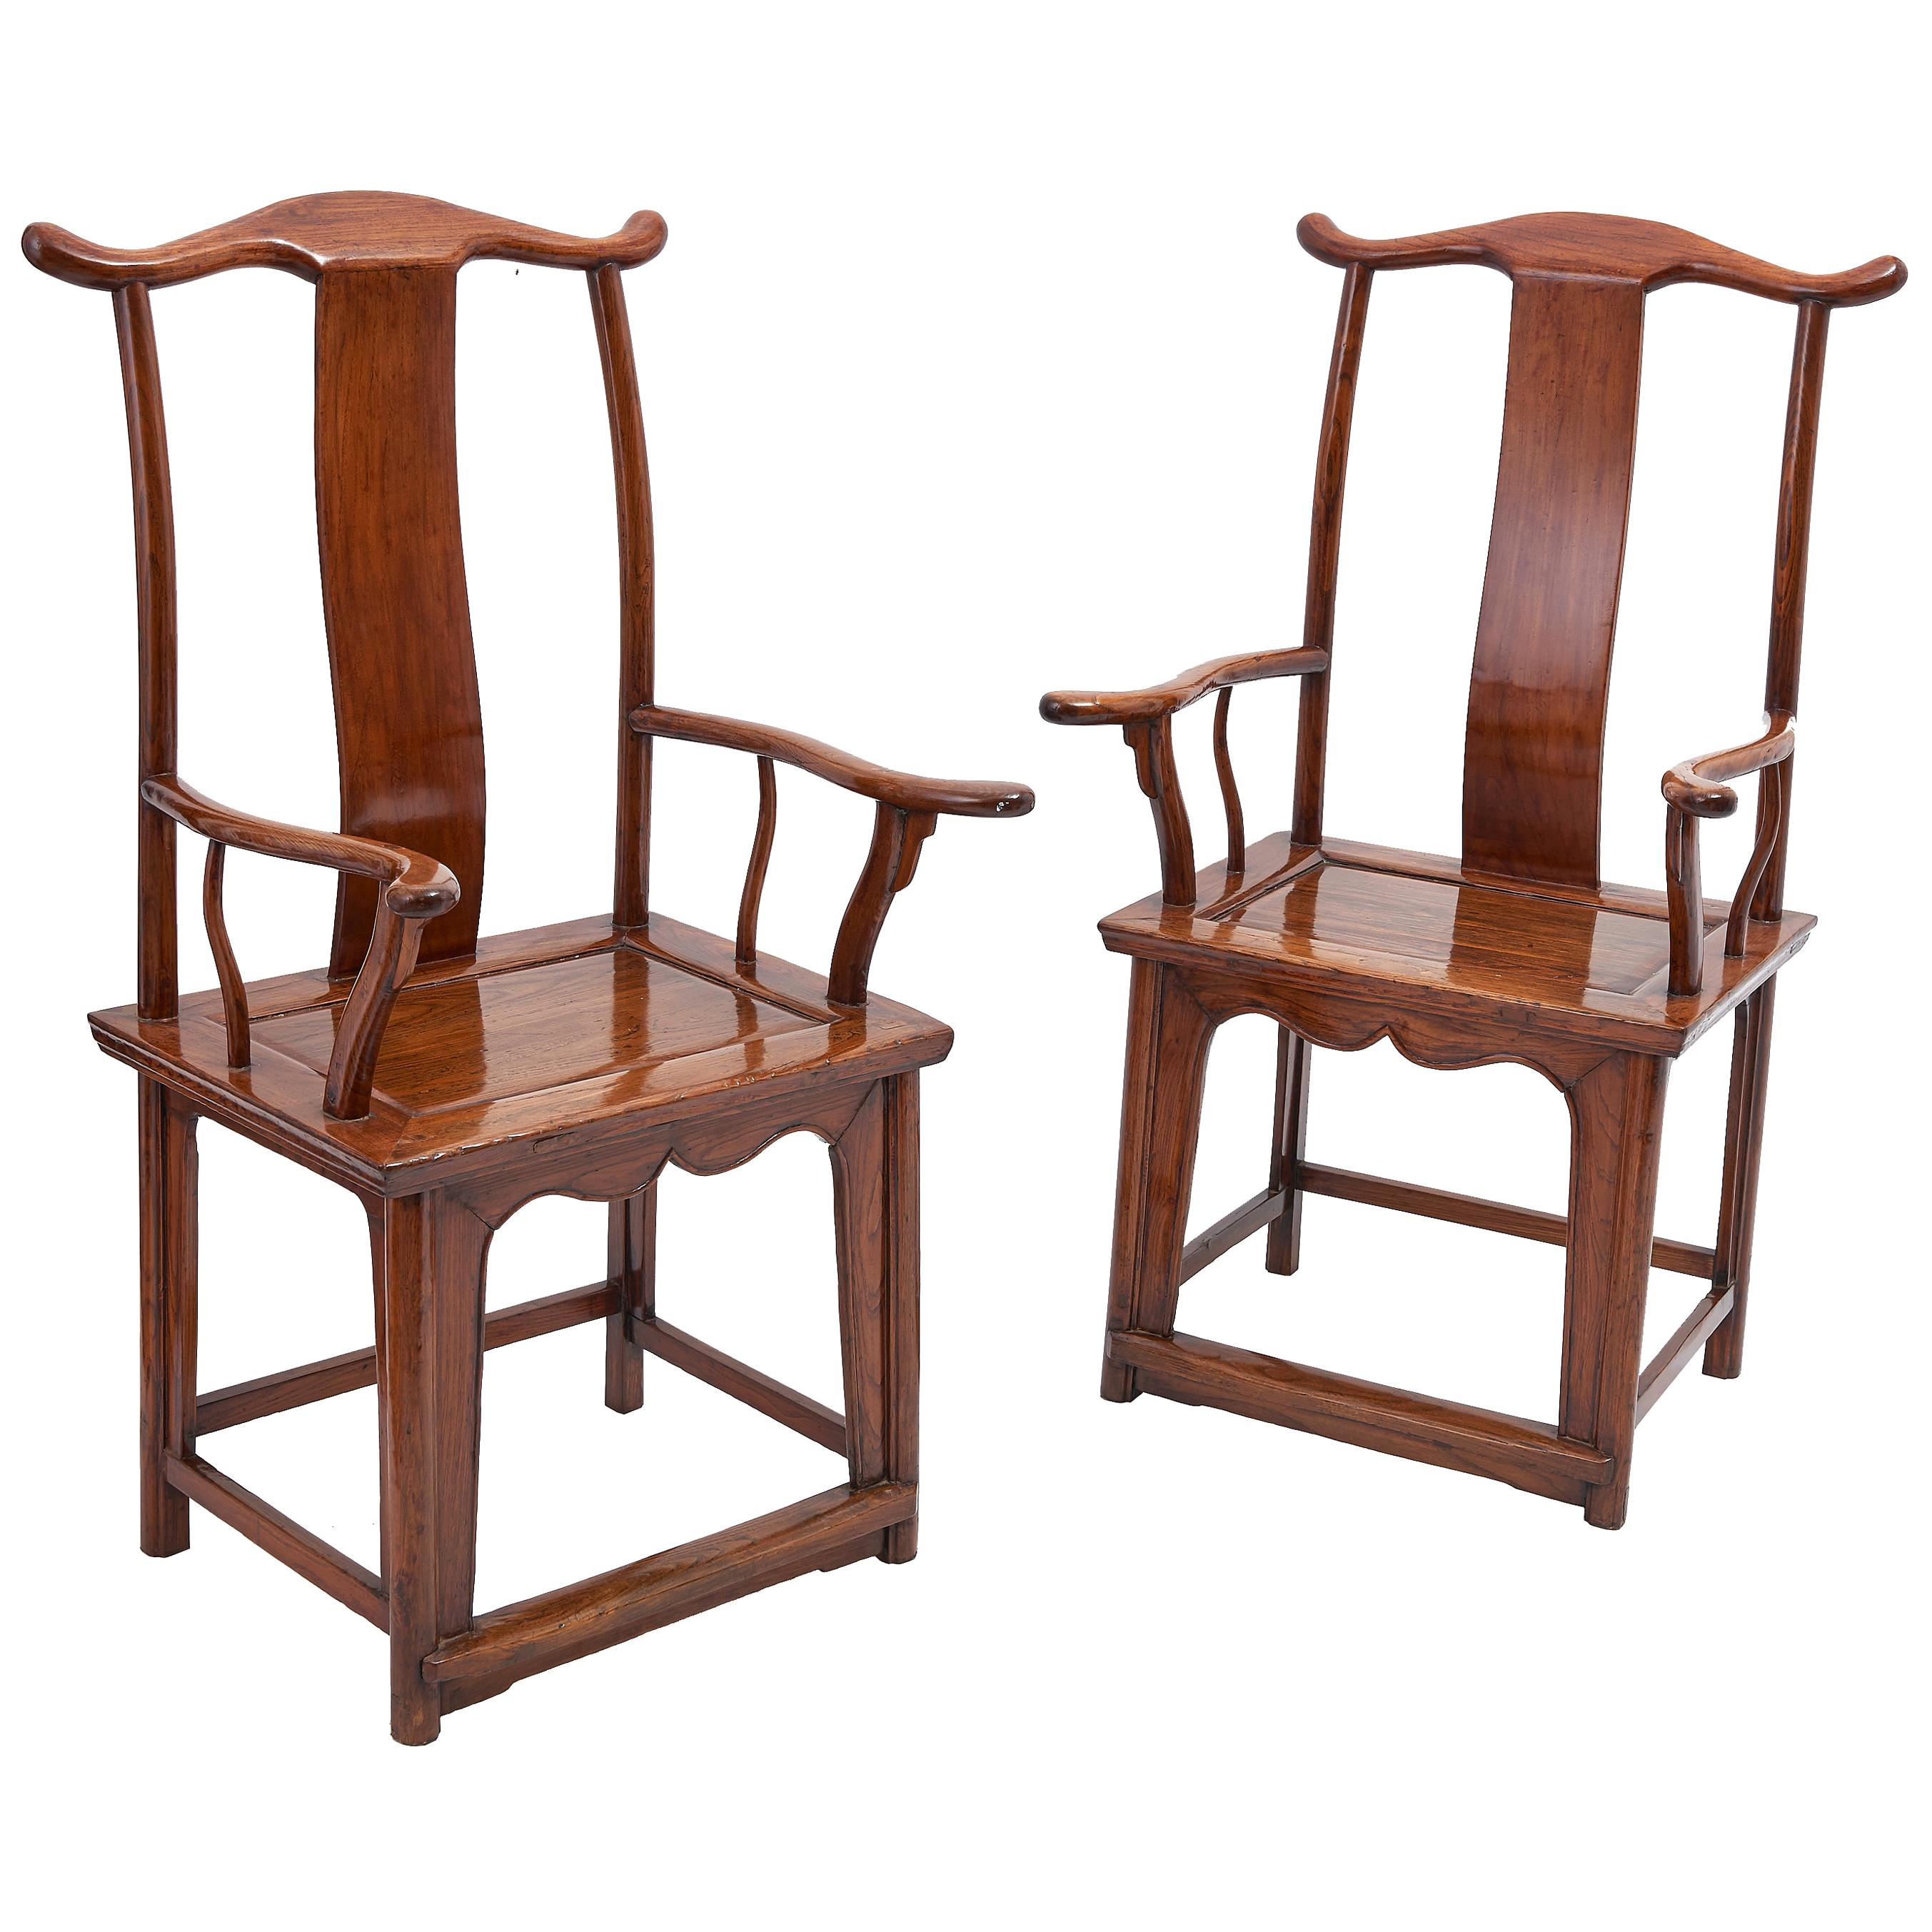 Pair of Chinese Yoke-Back Elm Armchairs, 19th Century